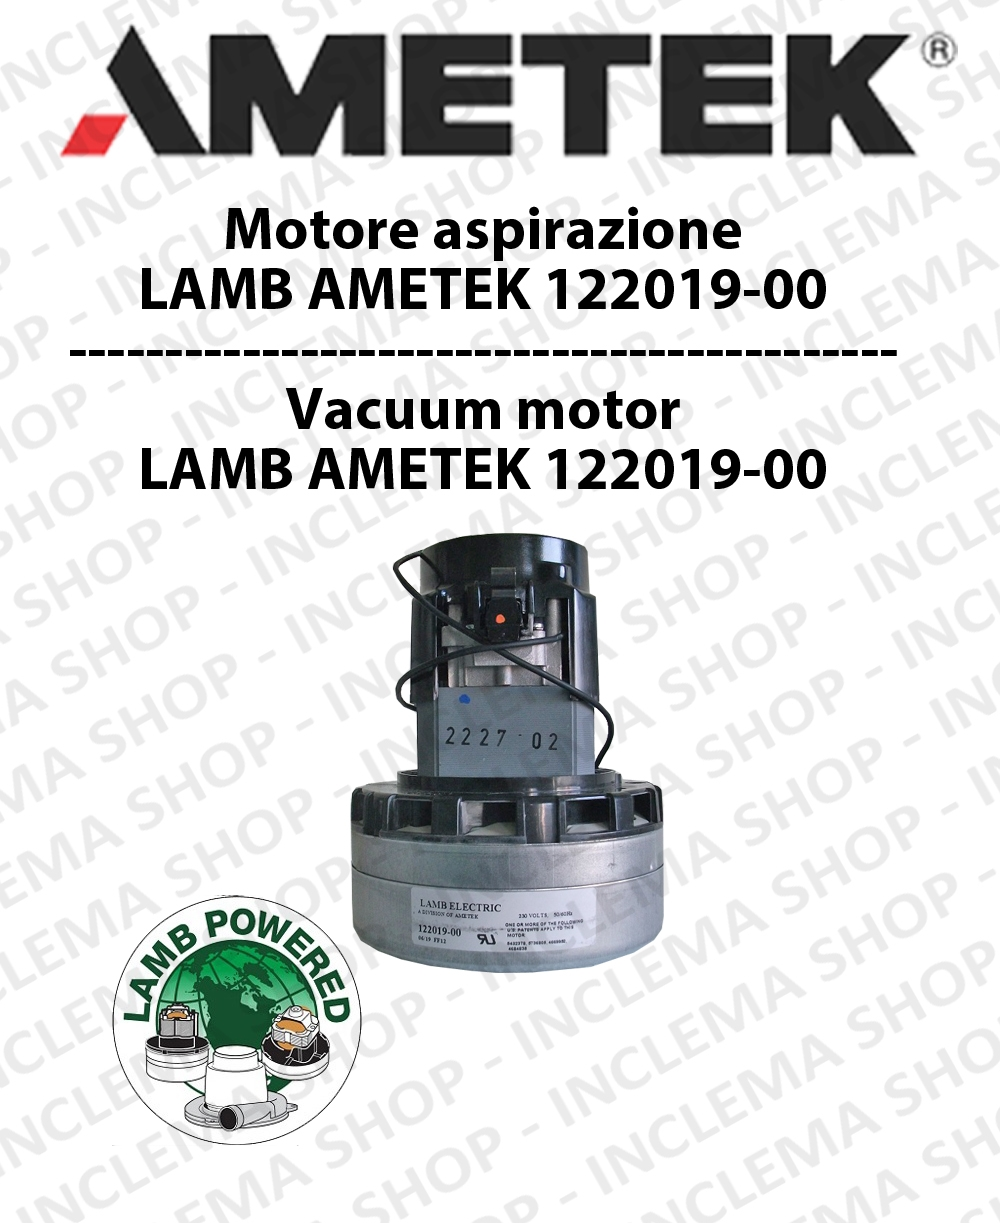 Vacuum motor 122019-00 AMETEK for scrubber dryer and vacuum cleaner